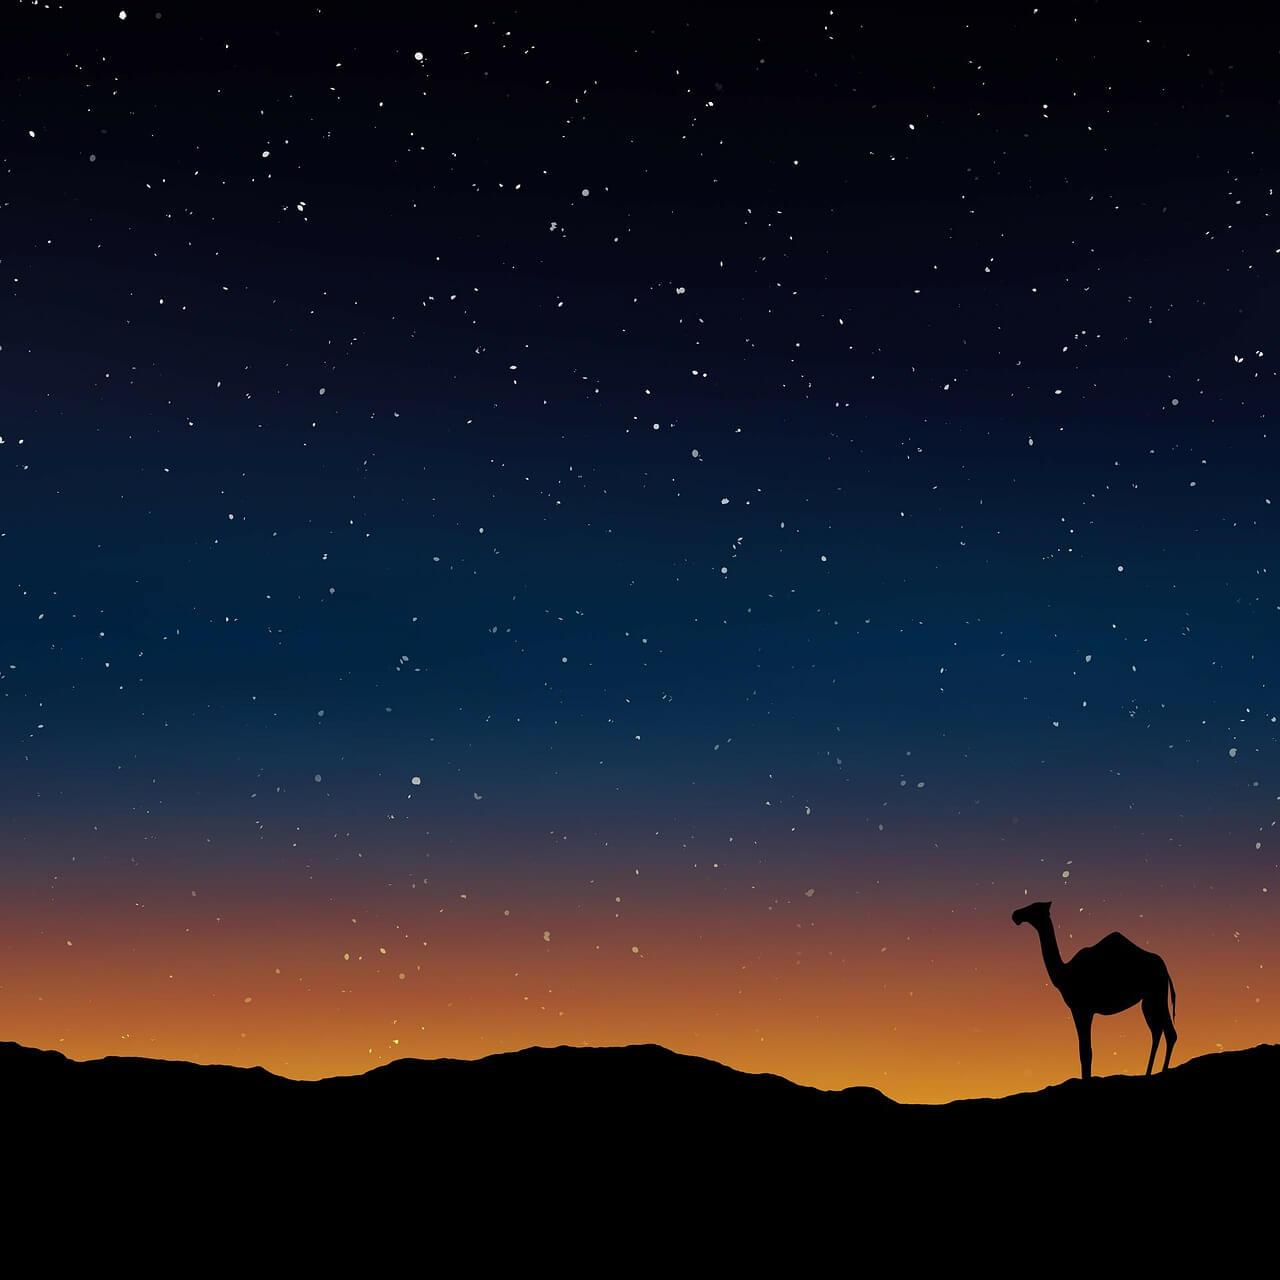 camel-163703_1280